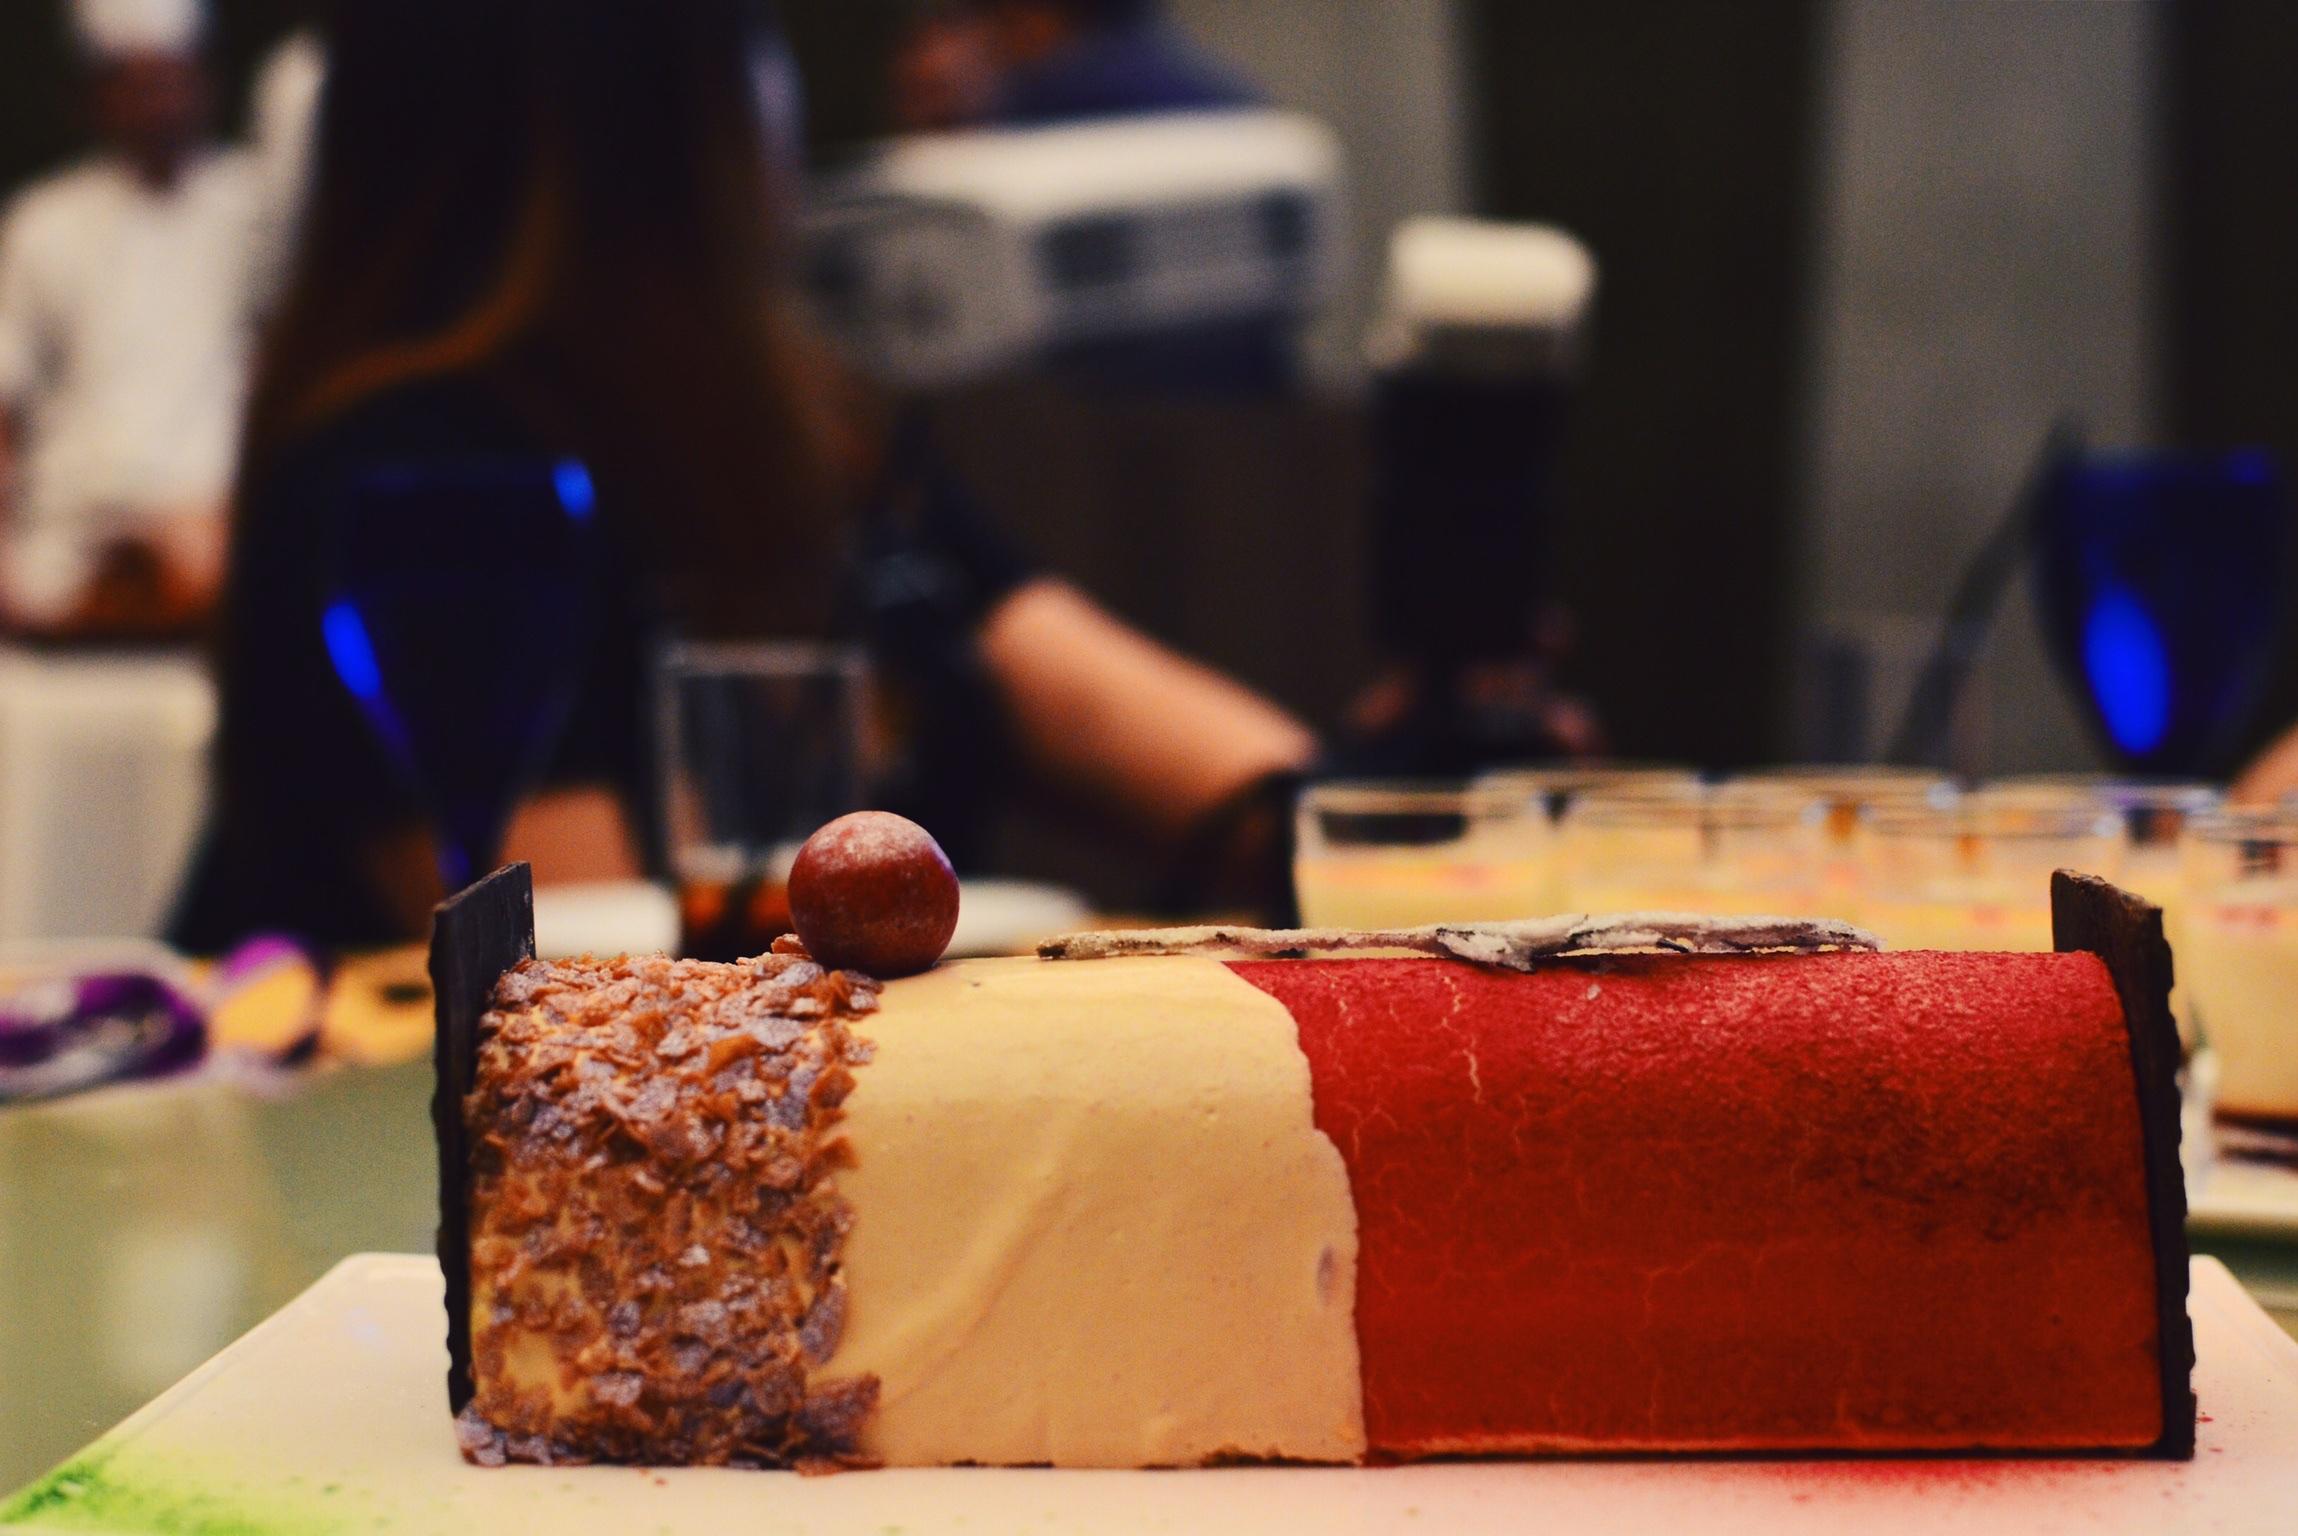 Crowne Plaza Changi Airport Yuzu Infused Log Cake (S$62+)